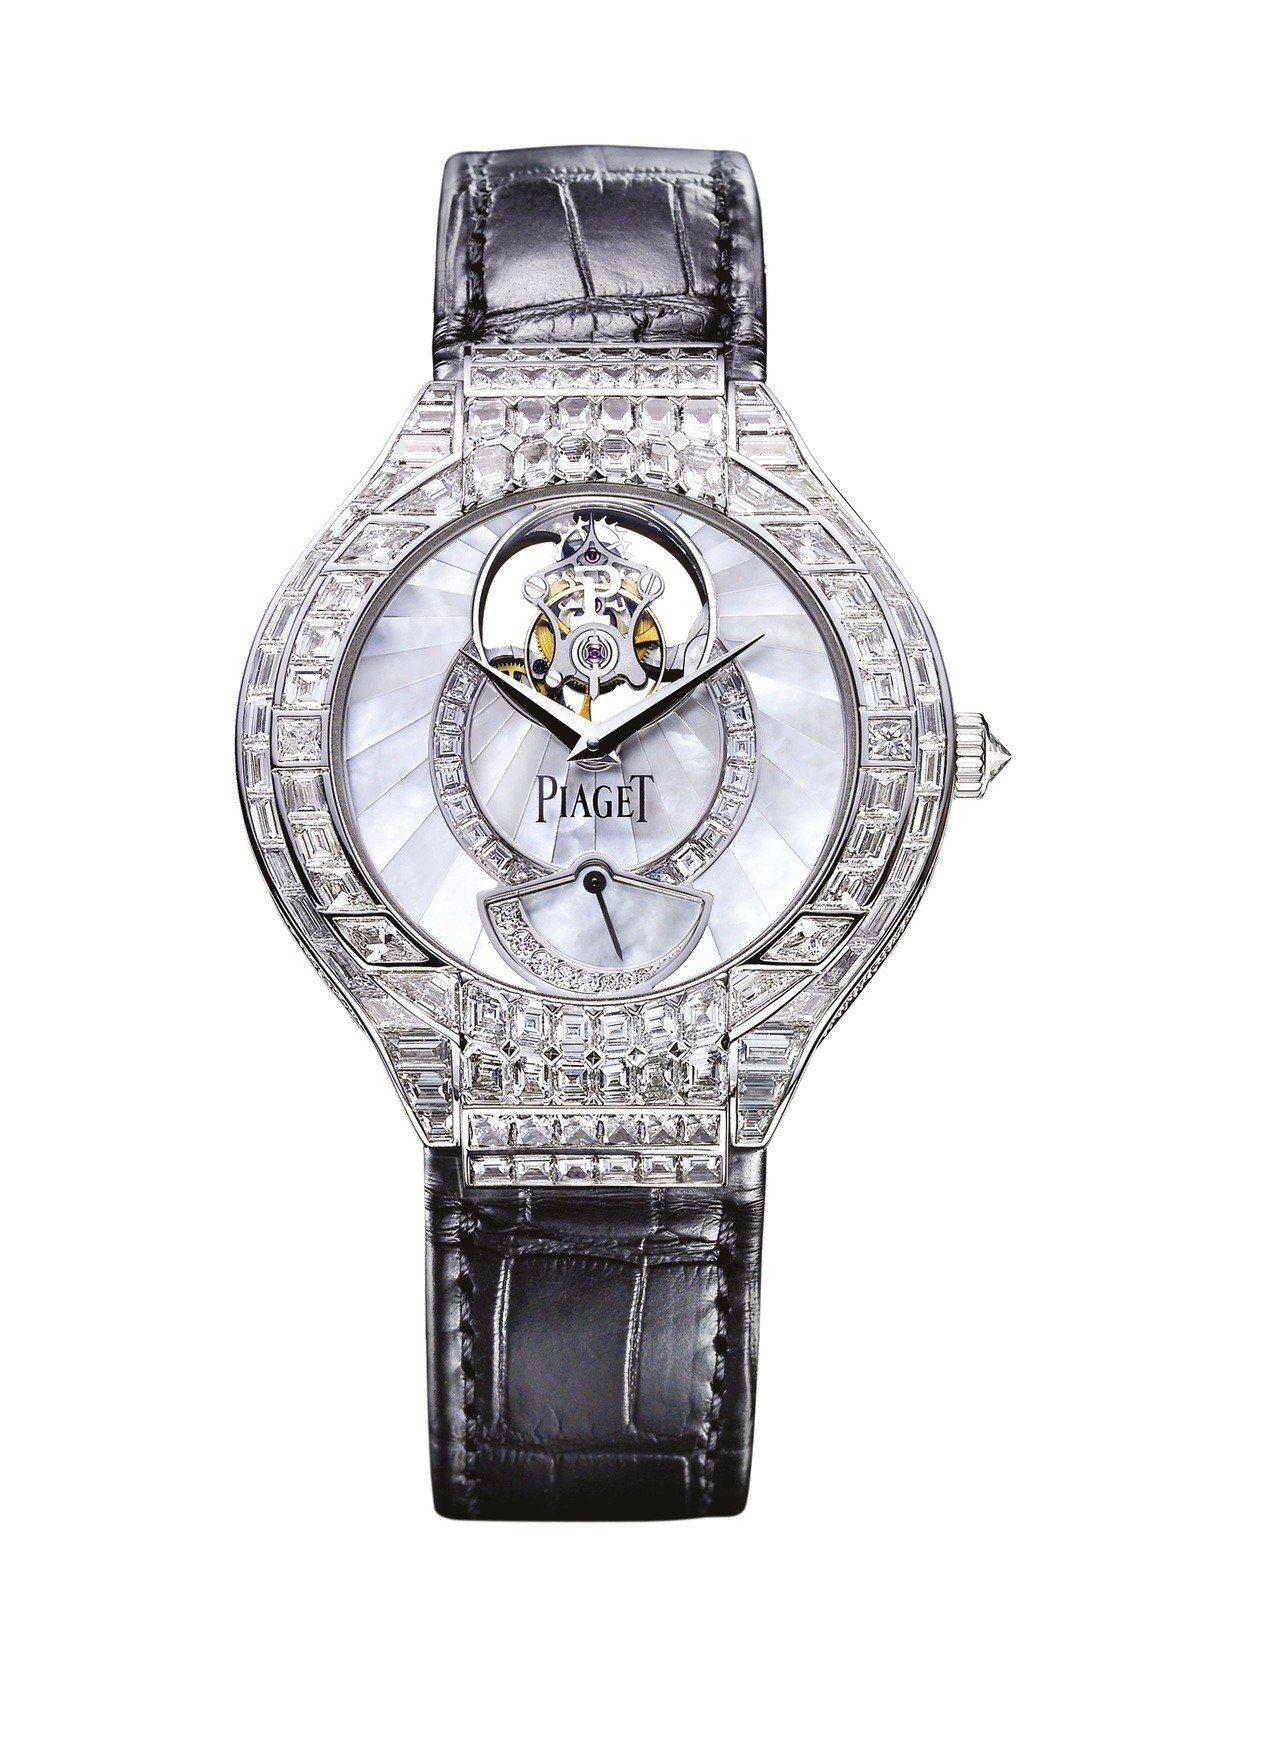 Piaget Polo 18K白金鑲鑽陀飛輪腕表,2,040萬元。圖/伯爵提供